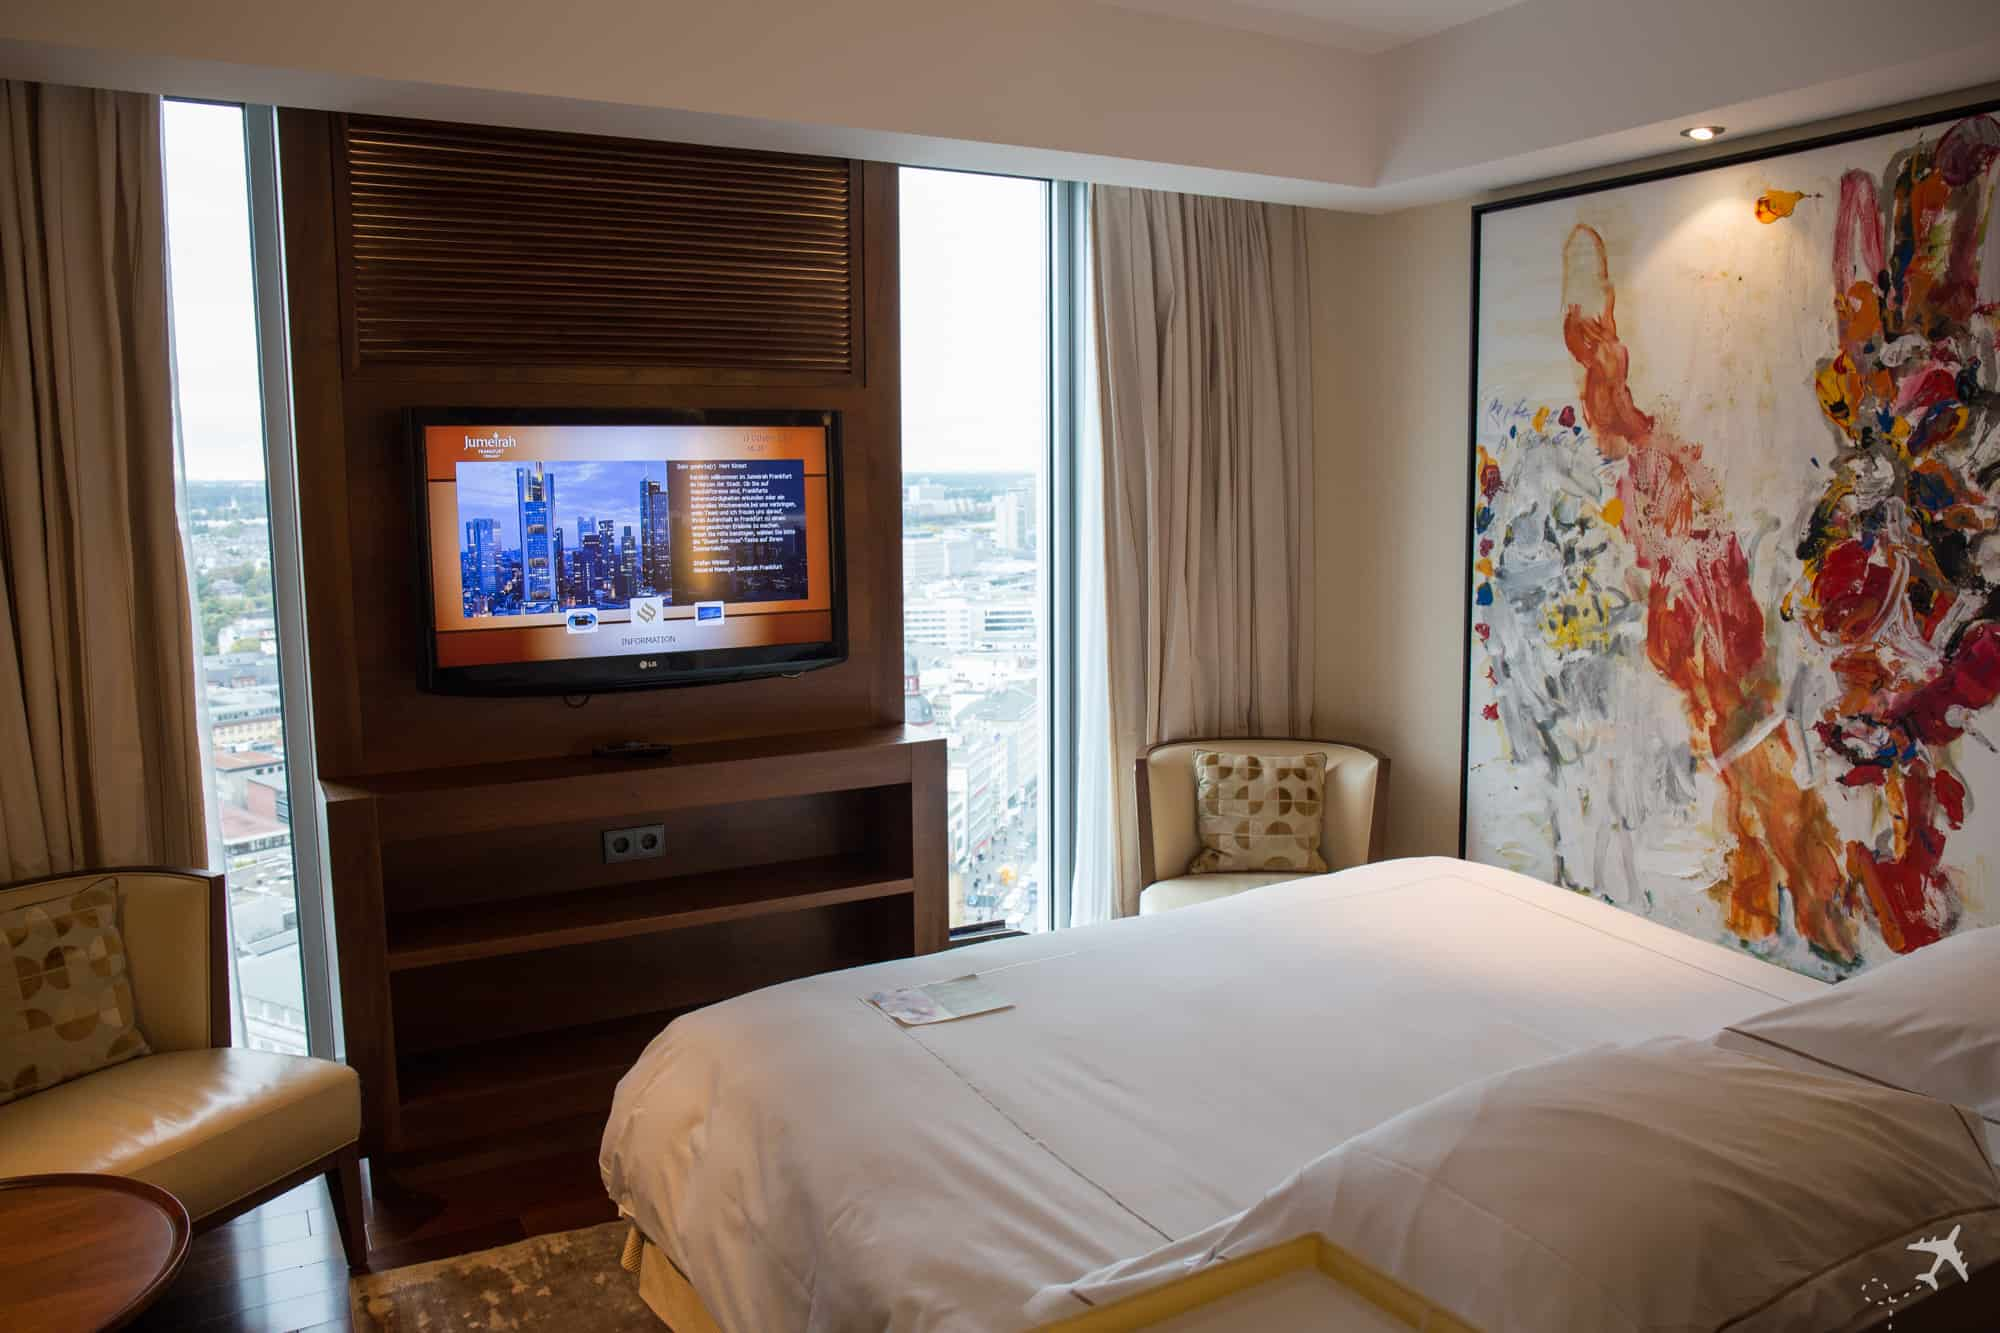 Jumeirah Hotel Frankfurt Schlafzimmer Ausblick